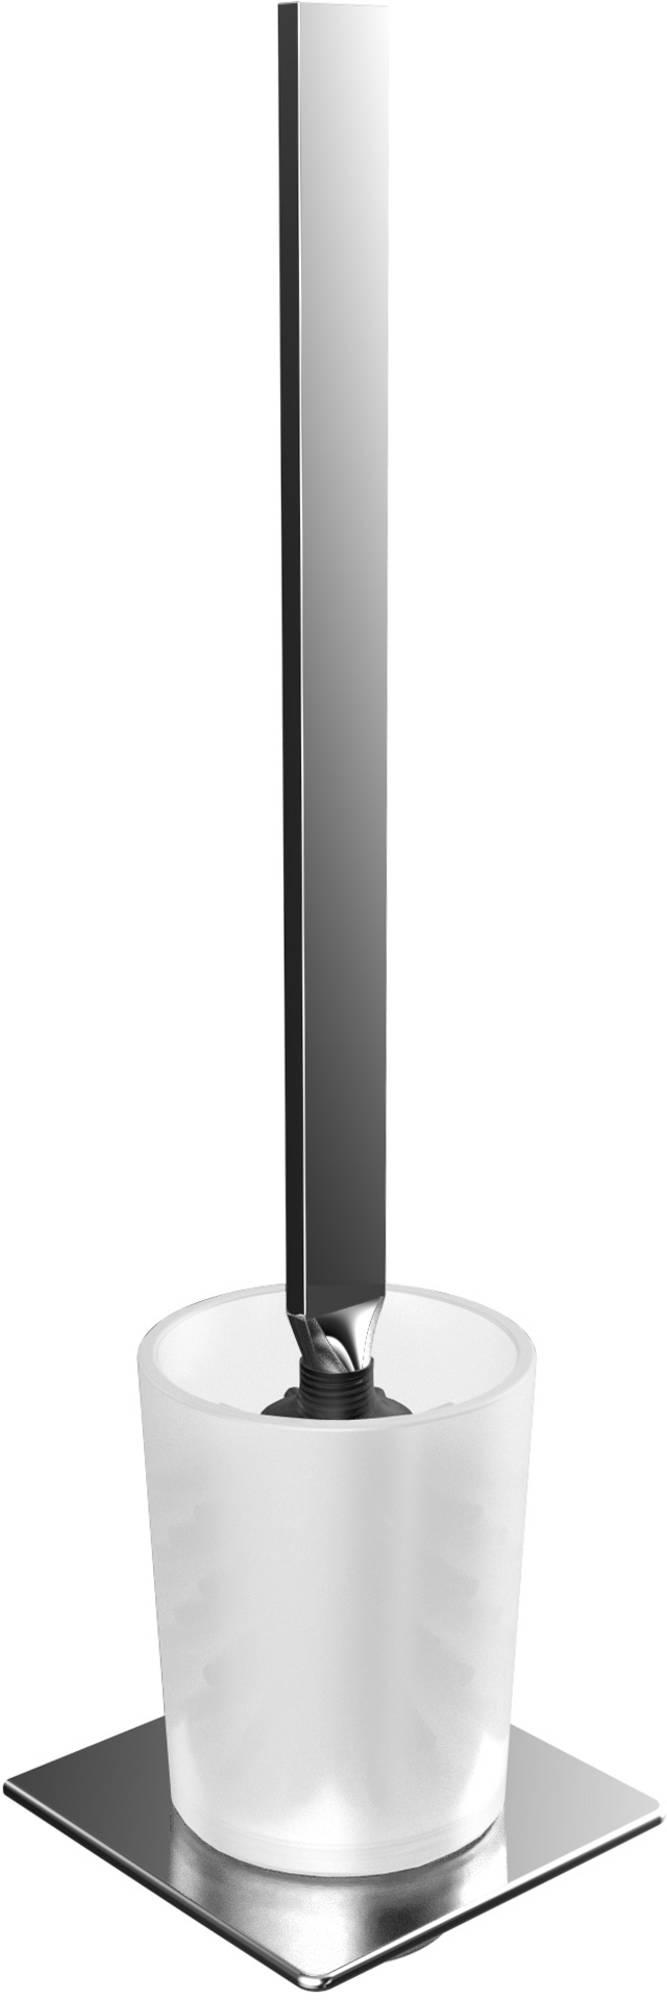 Emco Art Closetborstelgarnituur Gesatineerd Glas Wandmodel Chroom